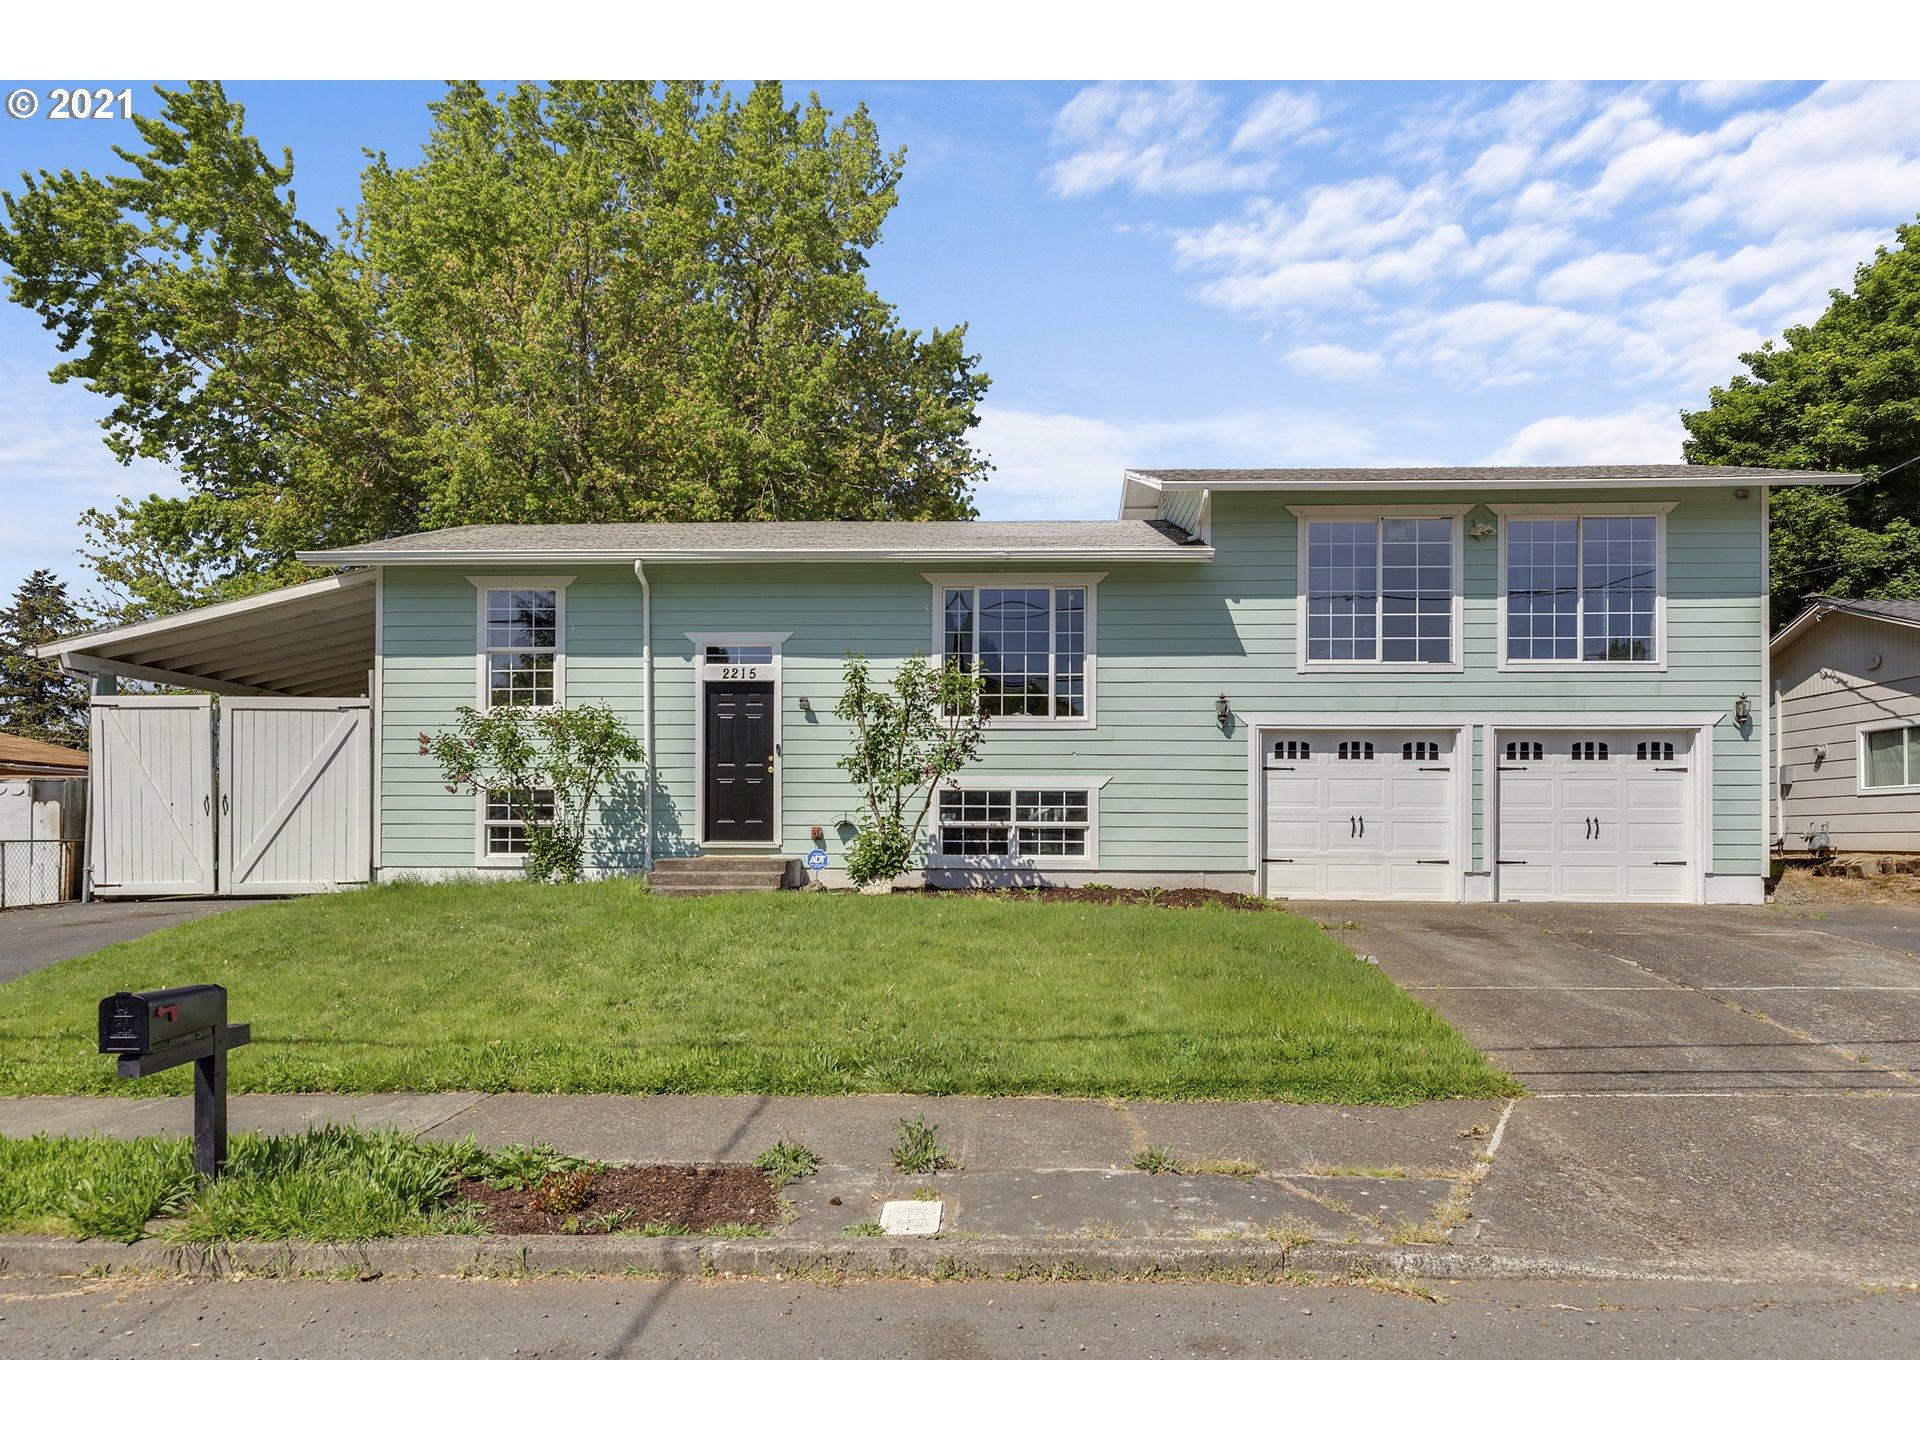 2215 SE 154TH AVE, Portland OR 97233